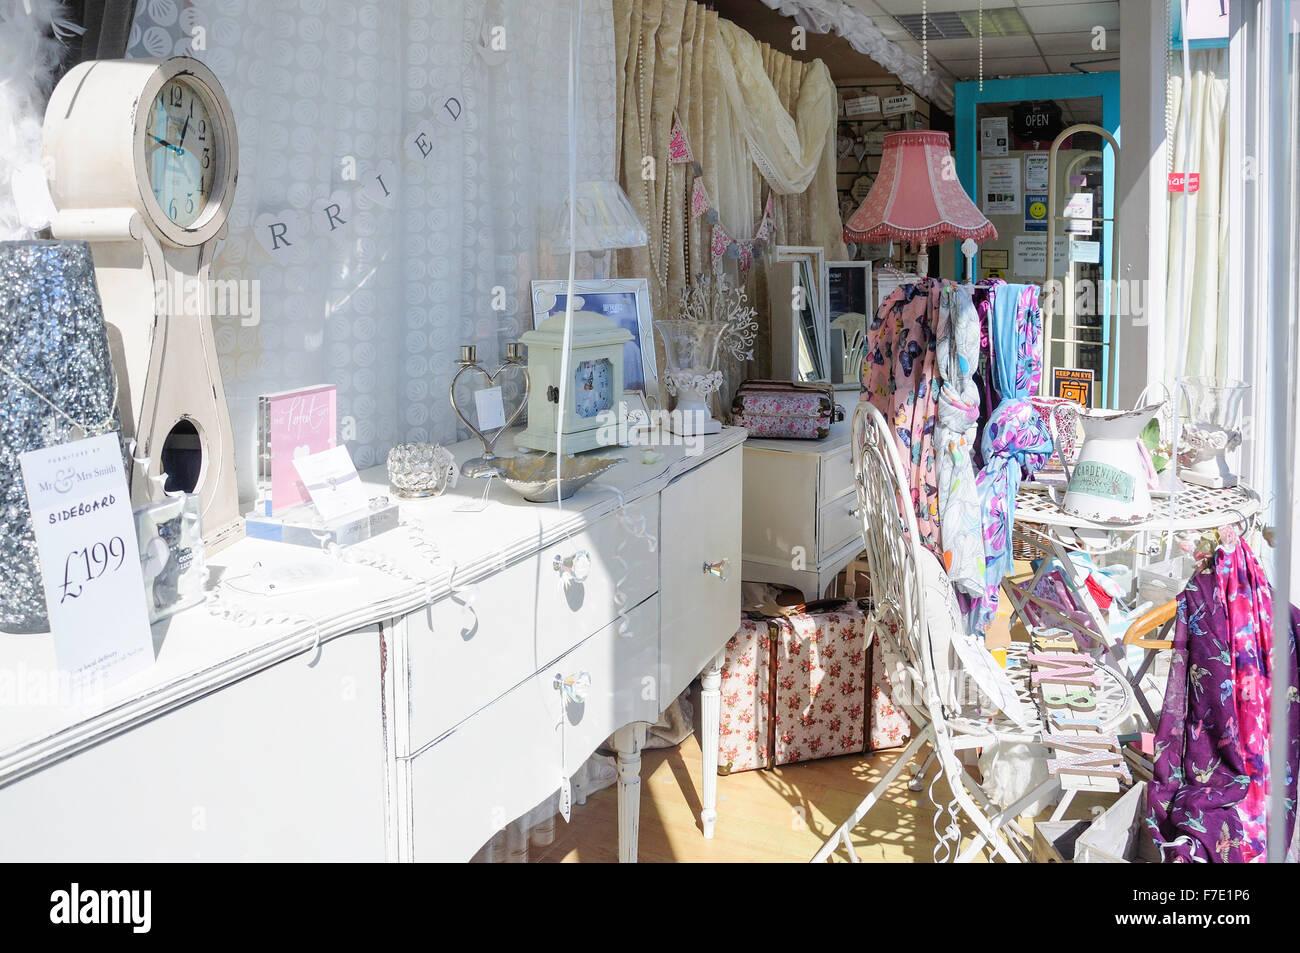 Afficher la fenêtre de magasin d'ameublement, High Street, Rayleigh, Essex, Angleterre, Royaume-Uni Photo Stock